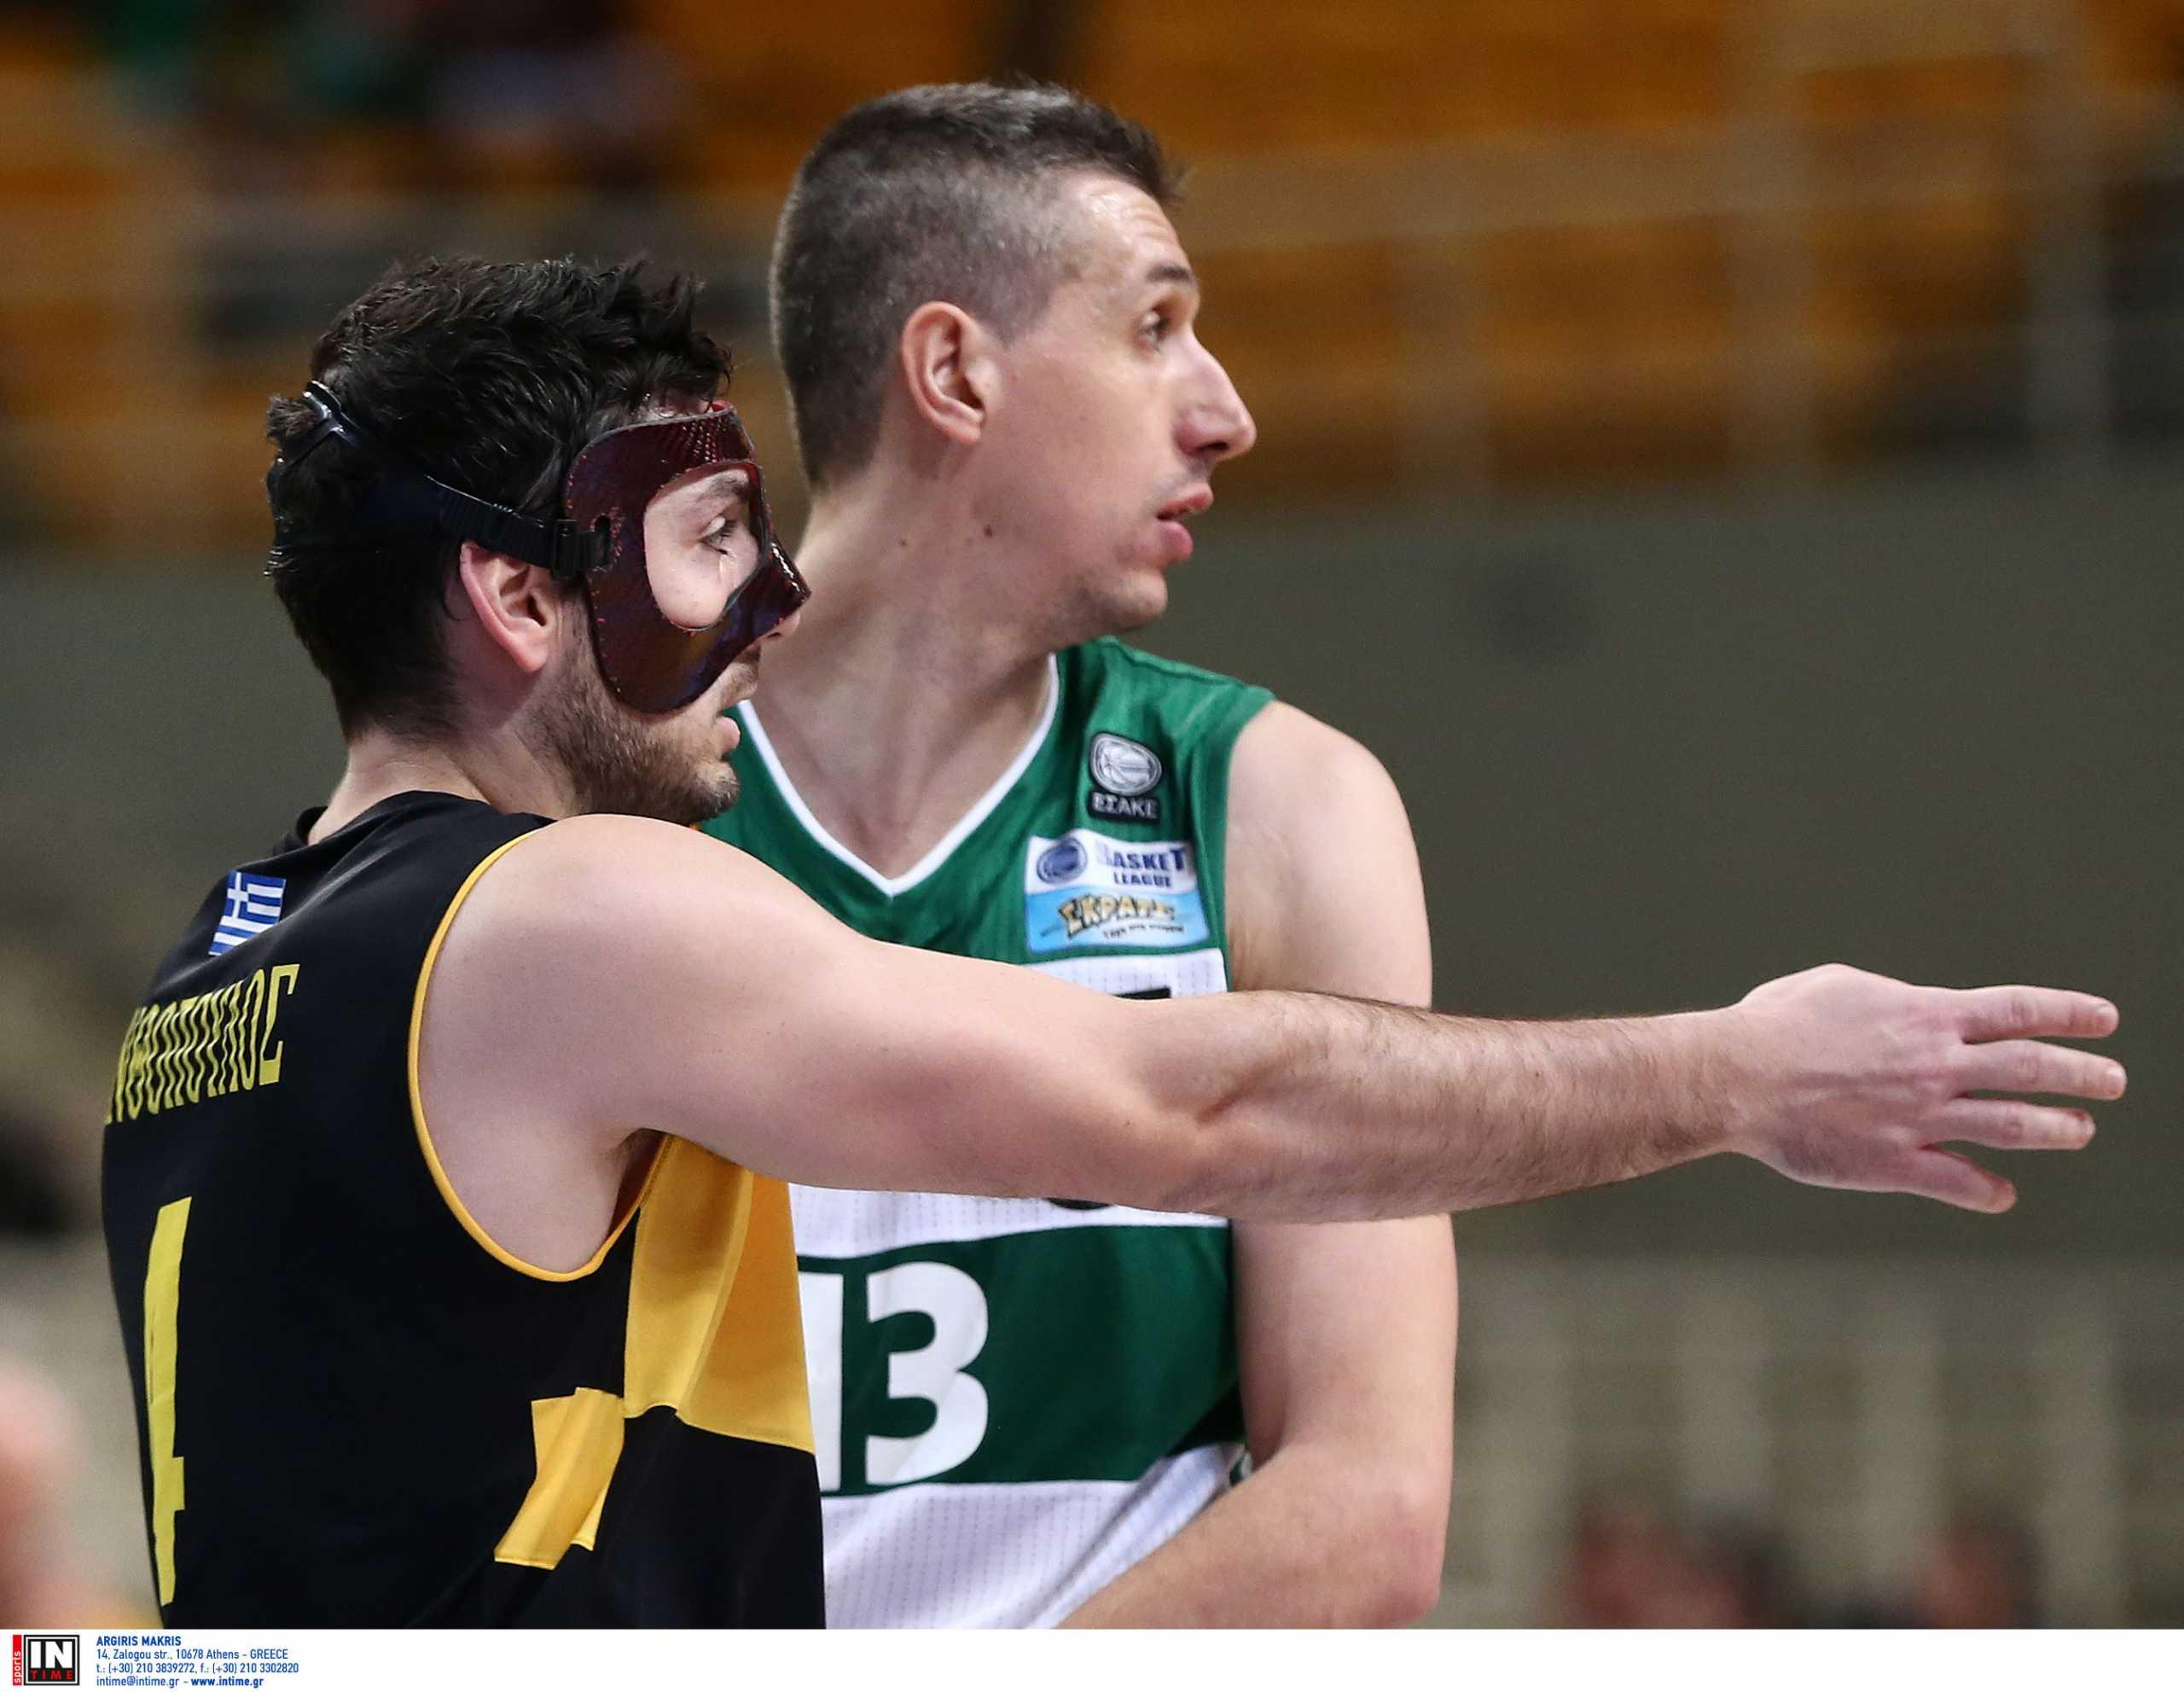 Basket League: Ο Βασίλης Ξανθόπουλος «έπιασε» Σπανούλη και Διαμαντίδη στις ασίστ